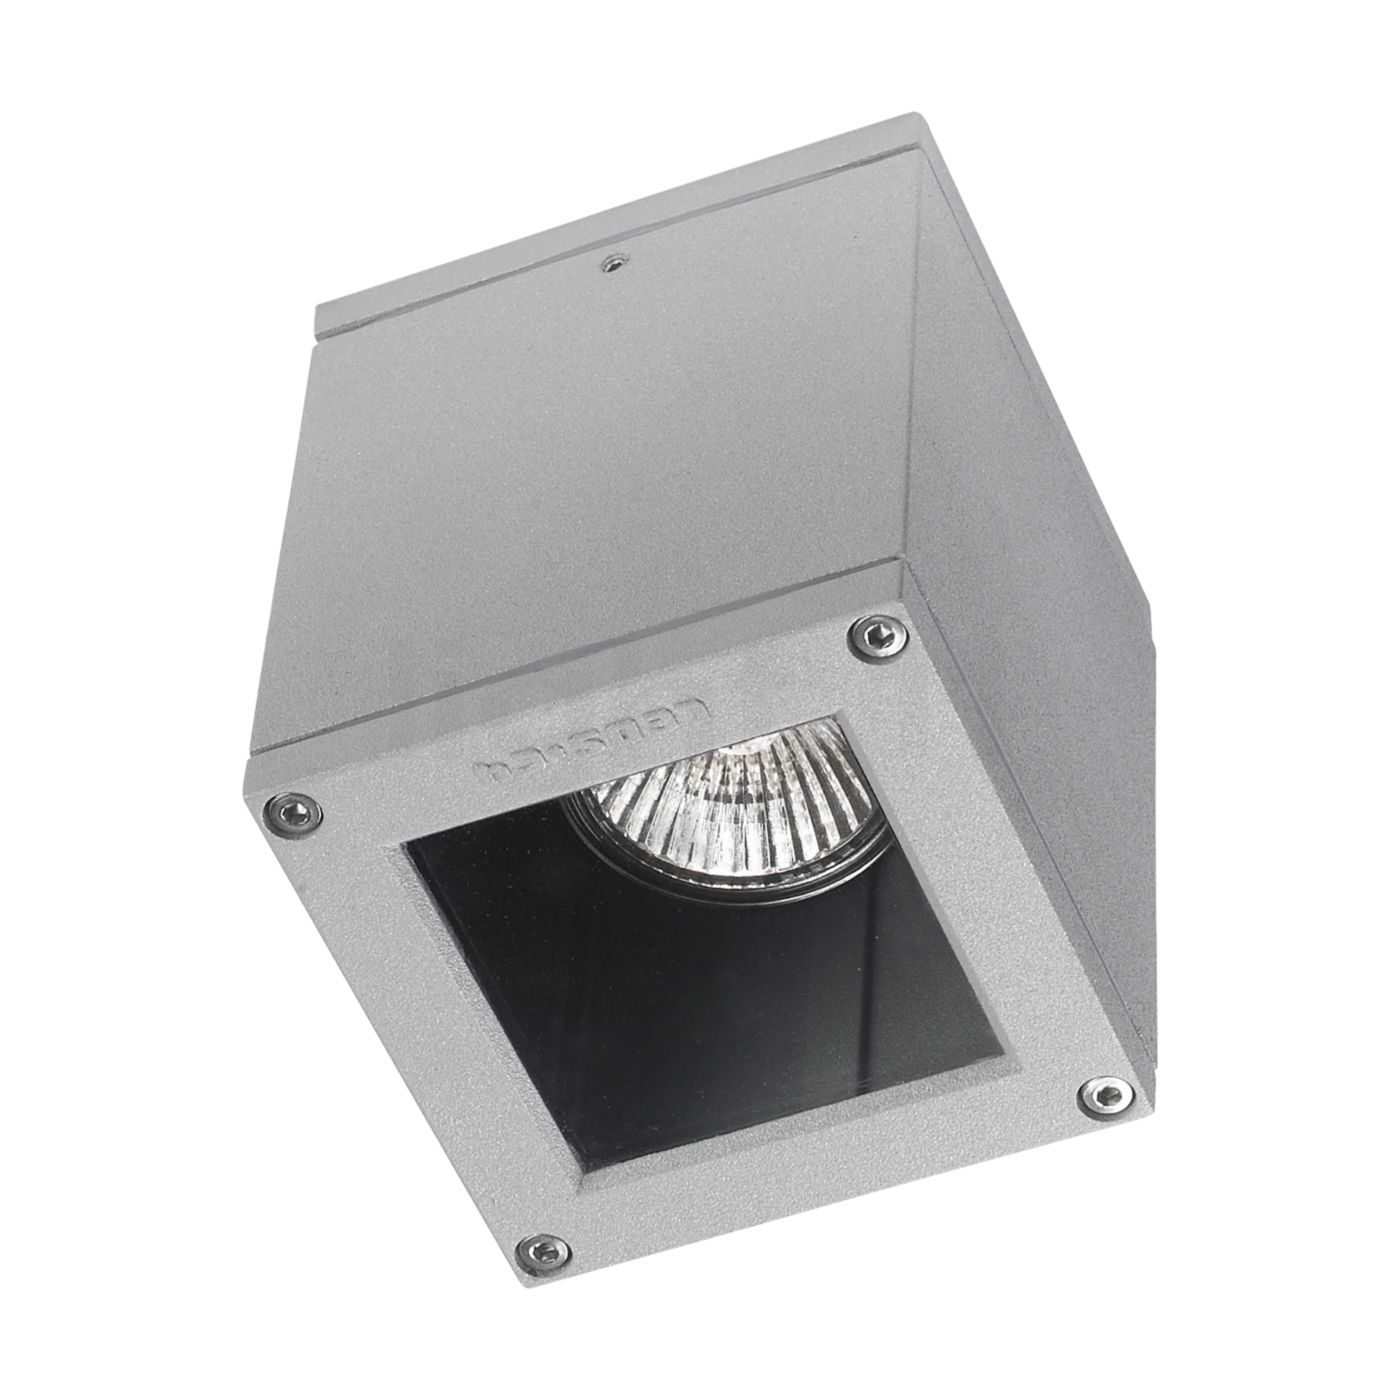 LEDS-C4 Afrodita GU10 Deckenleuchte, grau 15-9480-34-37